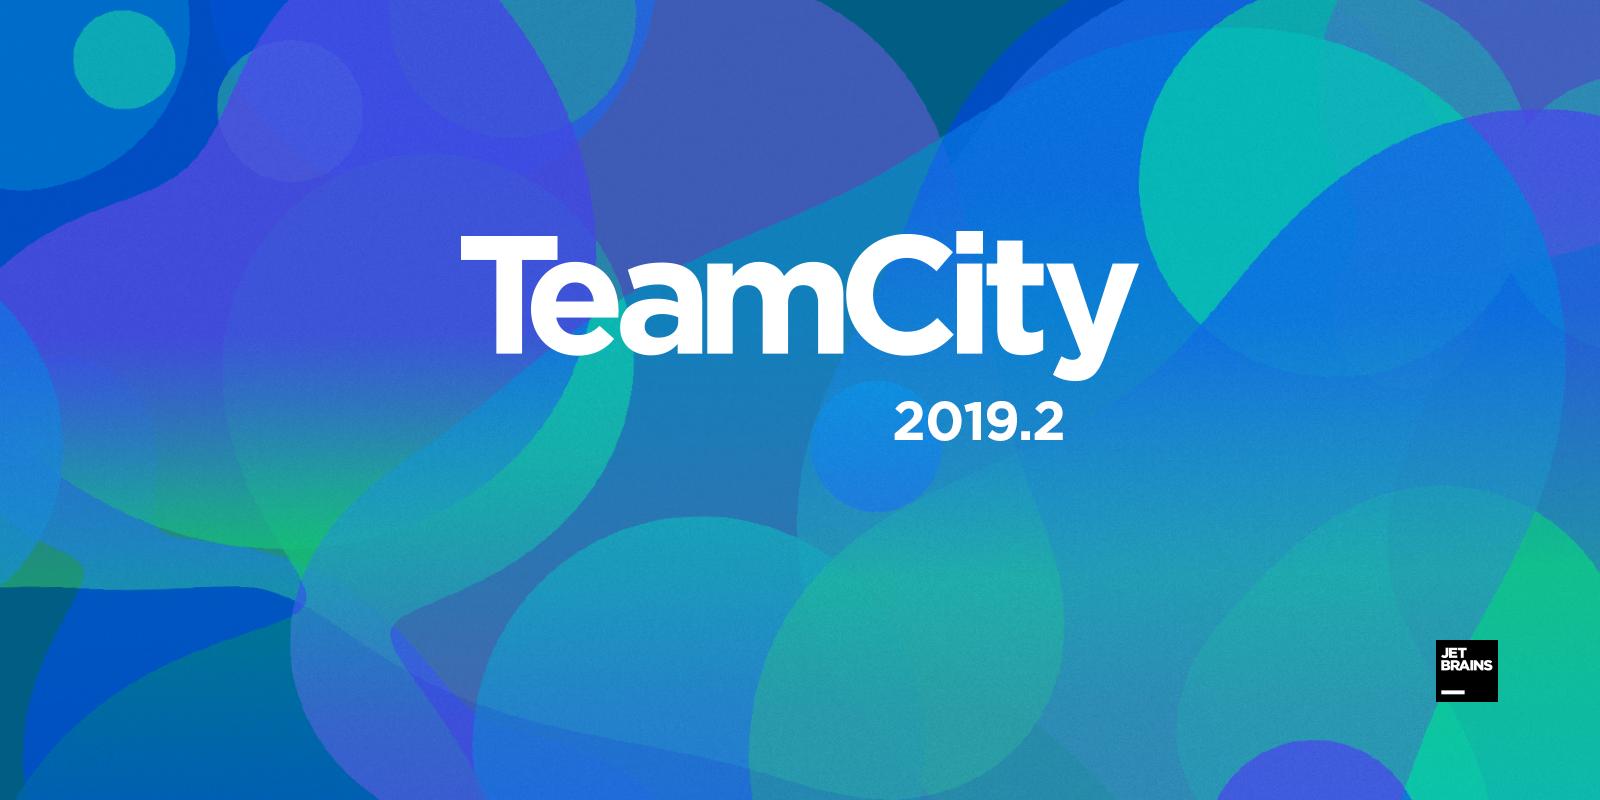 TeamCity 2019.2